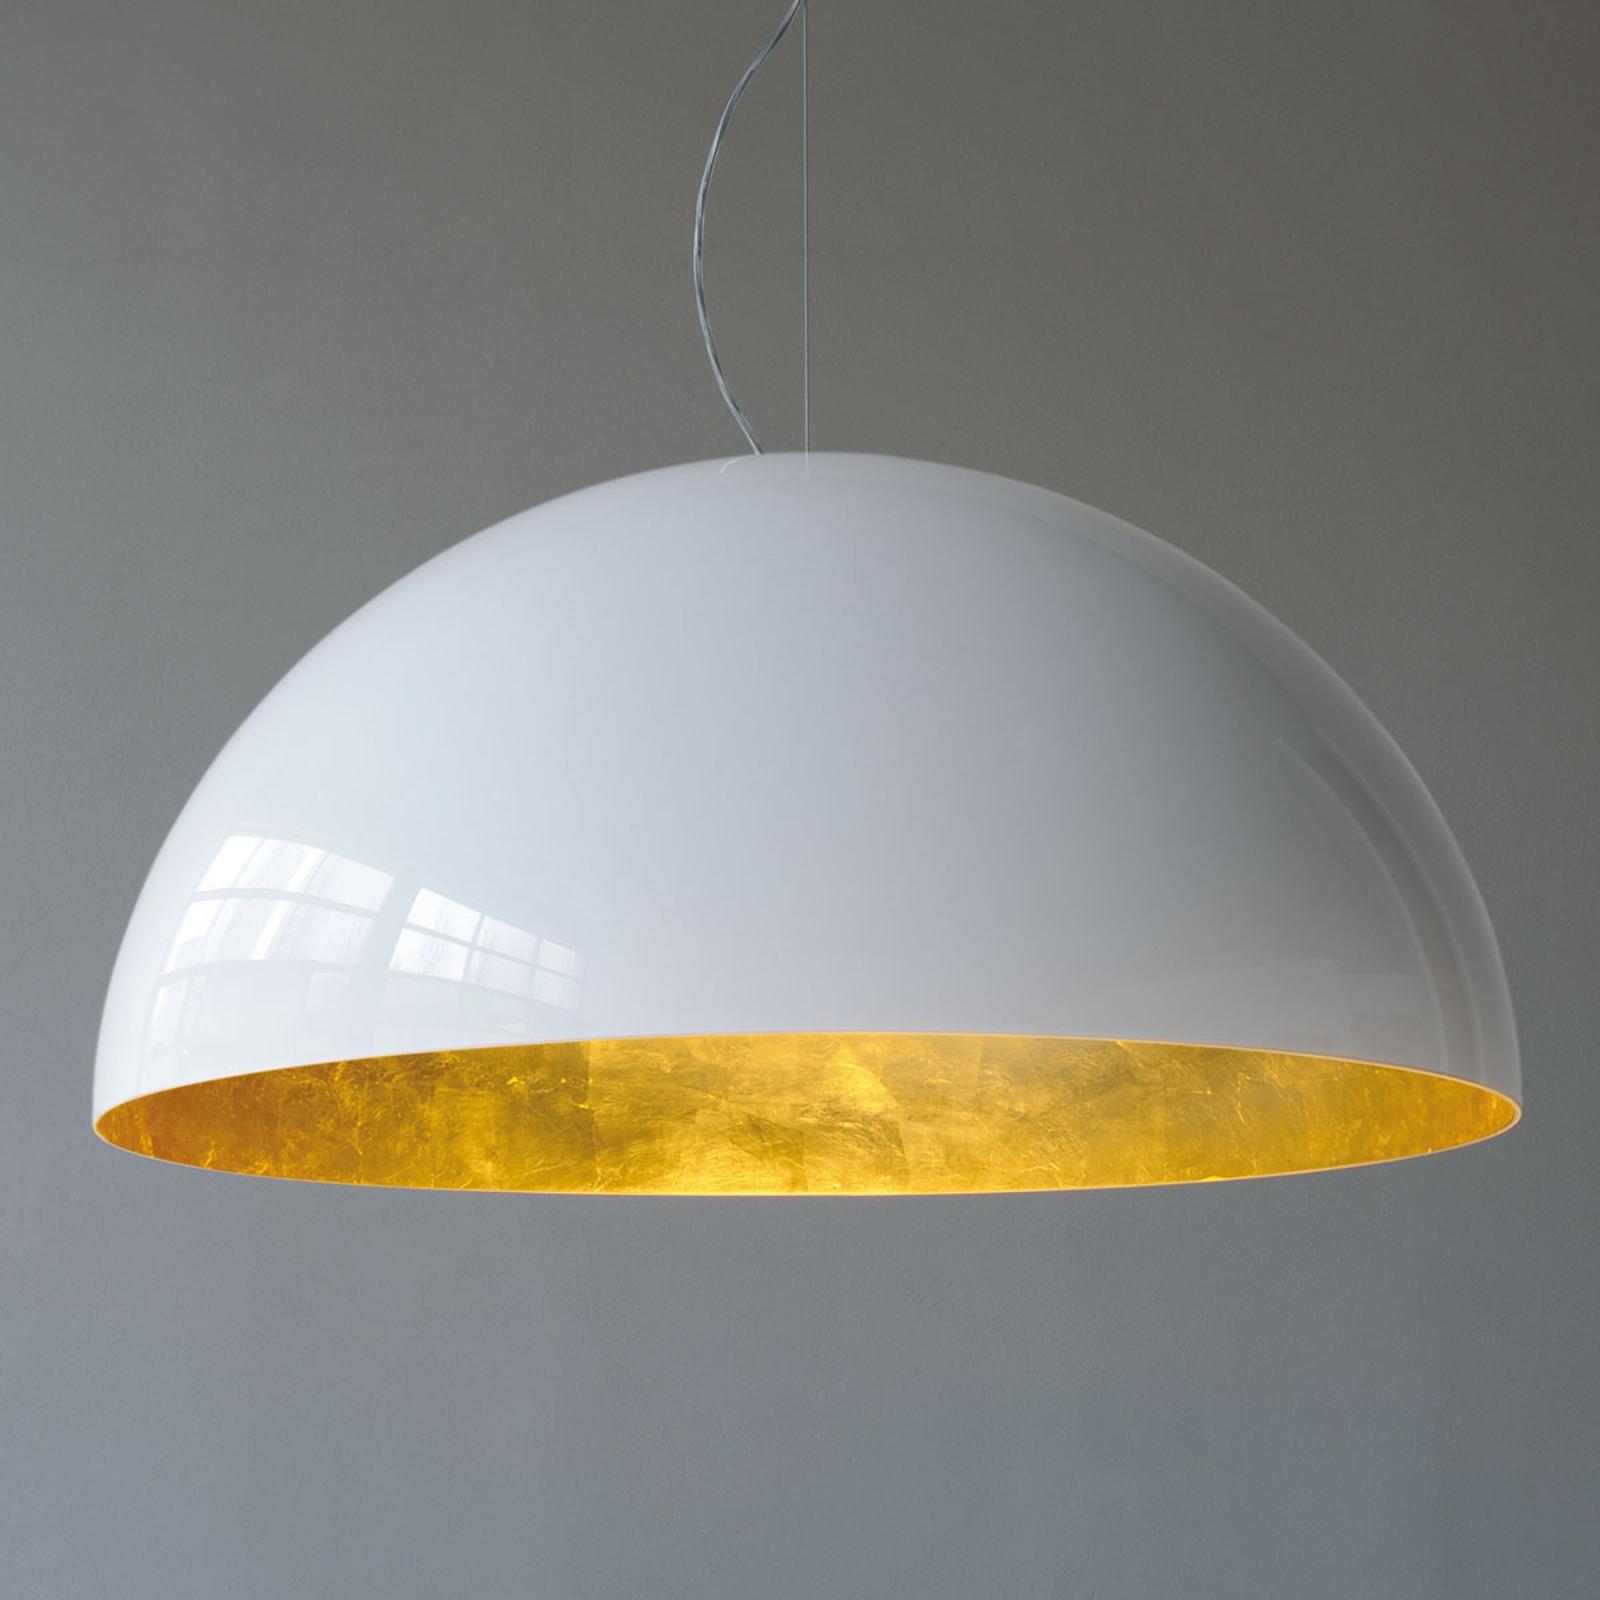 Semi-circular hanging light Sonora gold-coloured_7265040_1